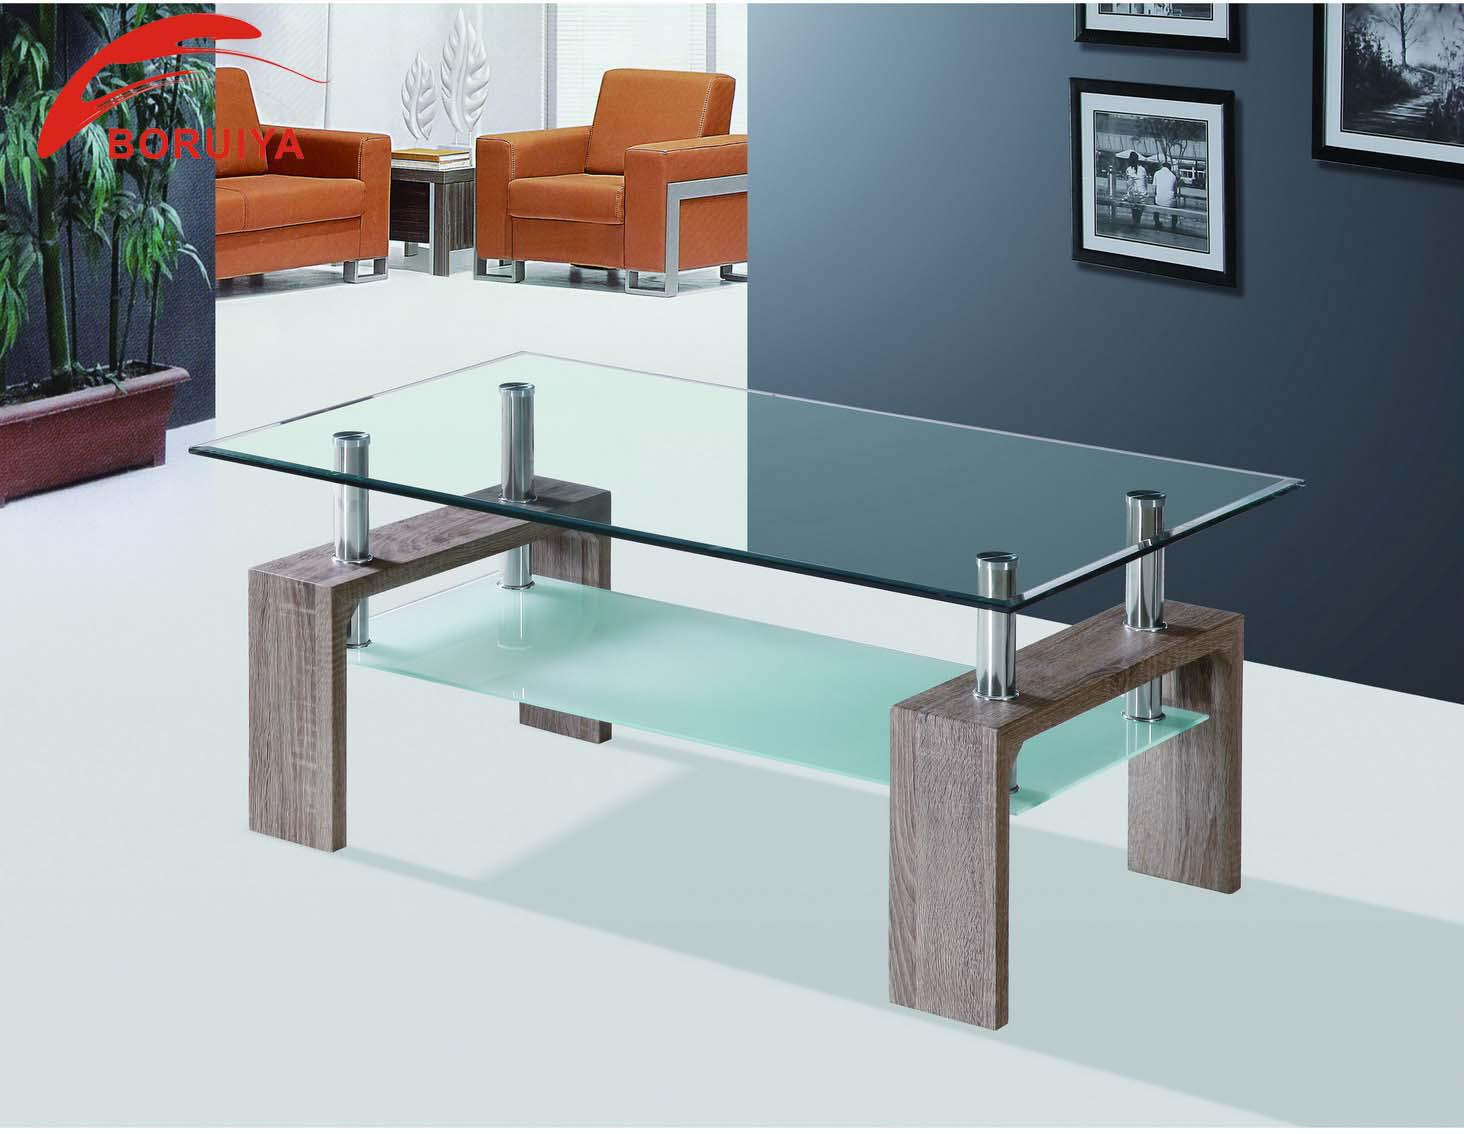 glass tea table design photo - 8